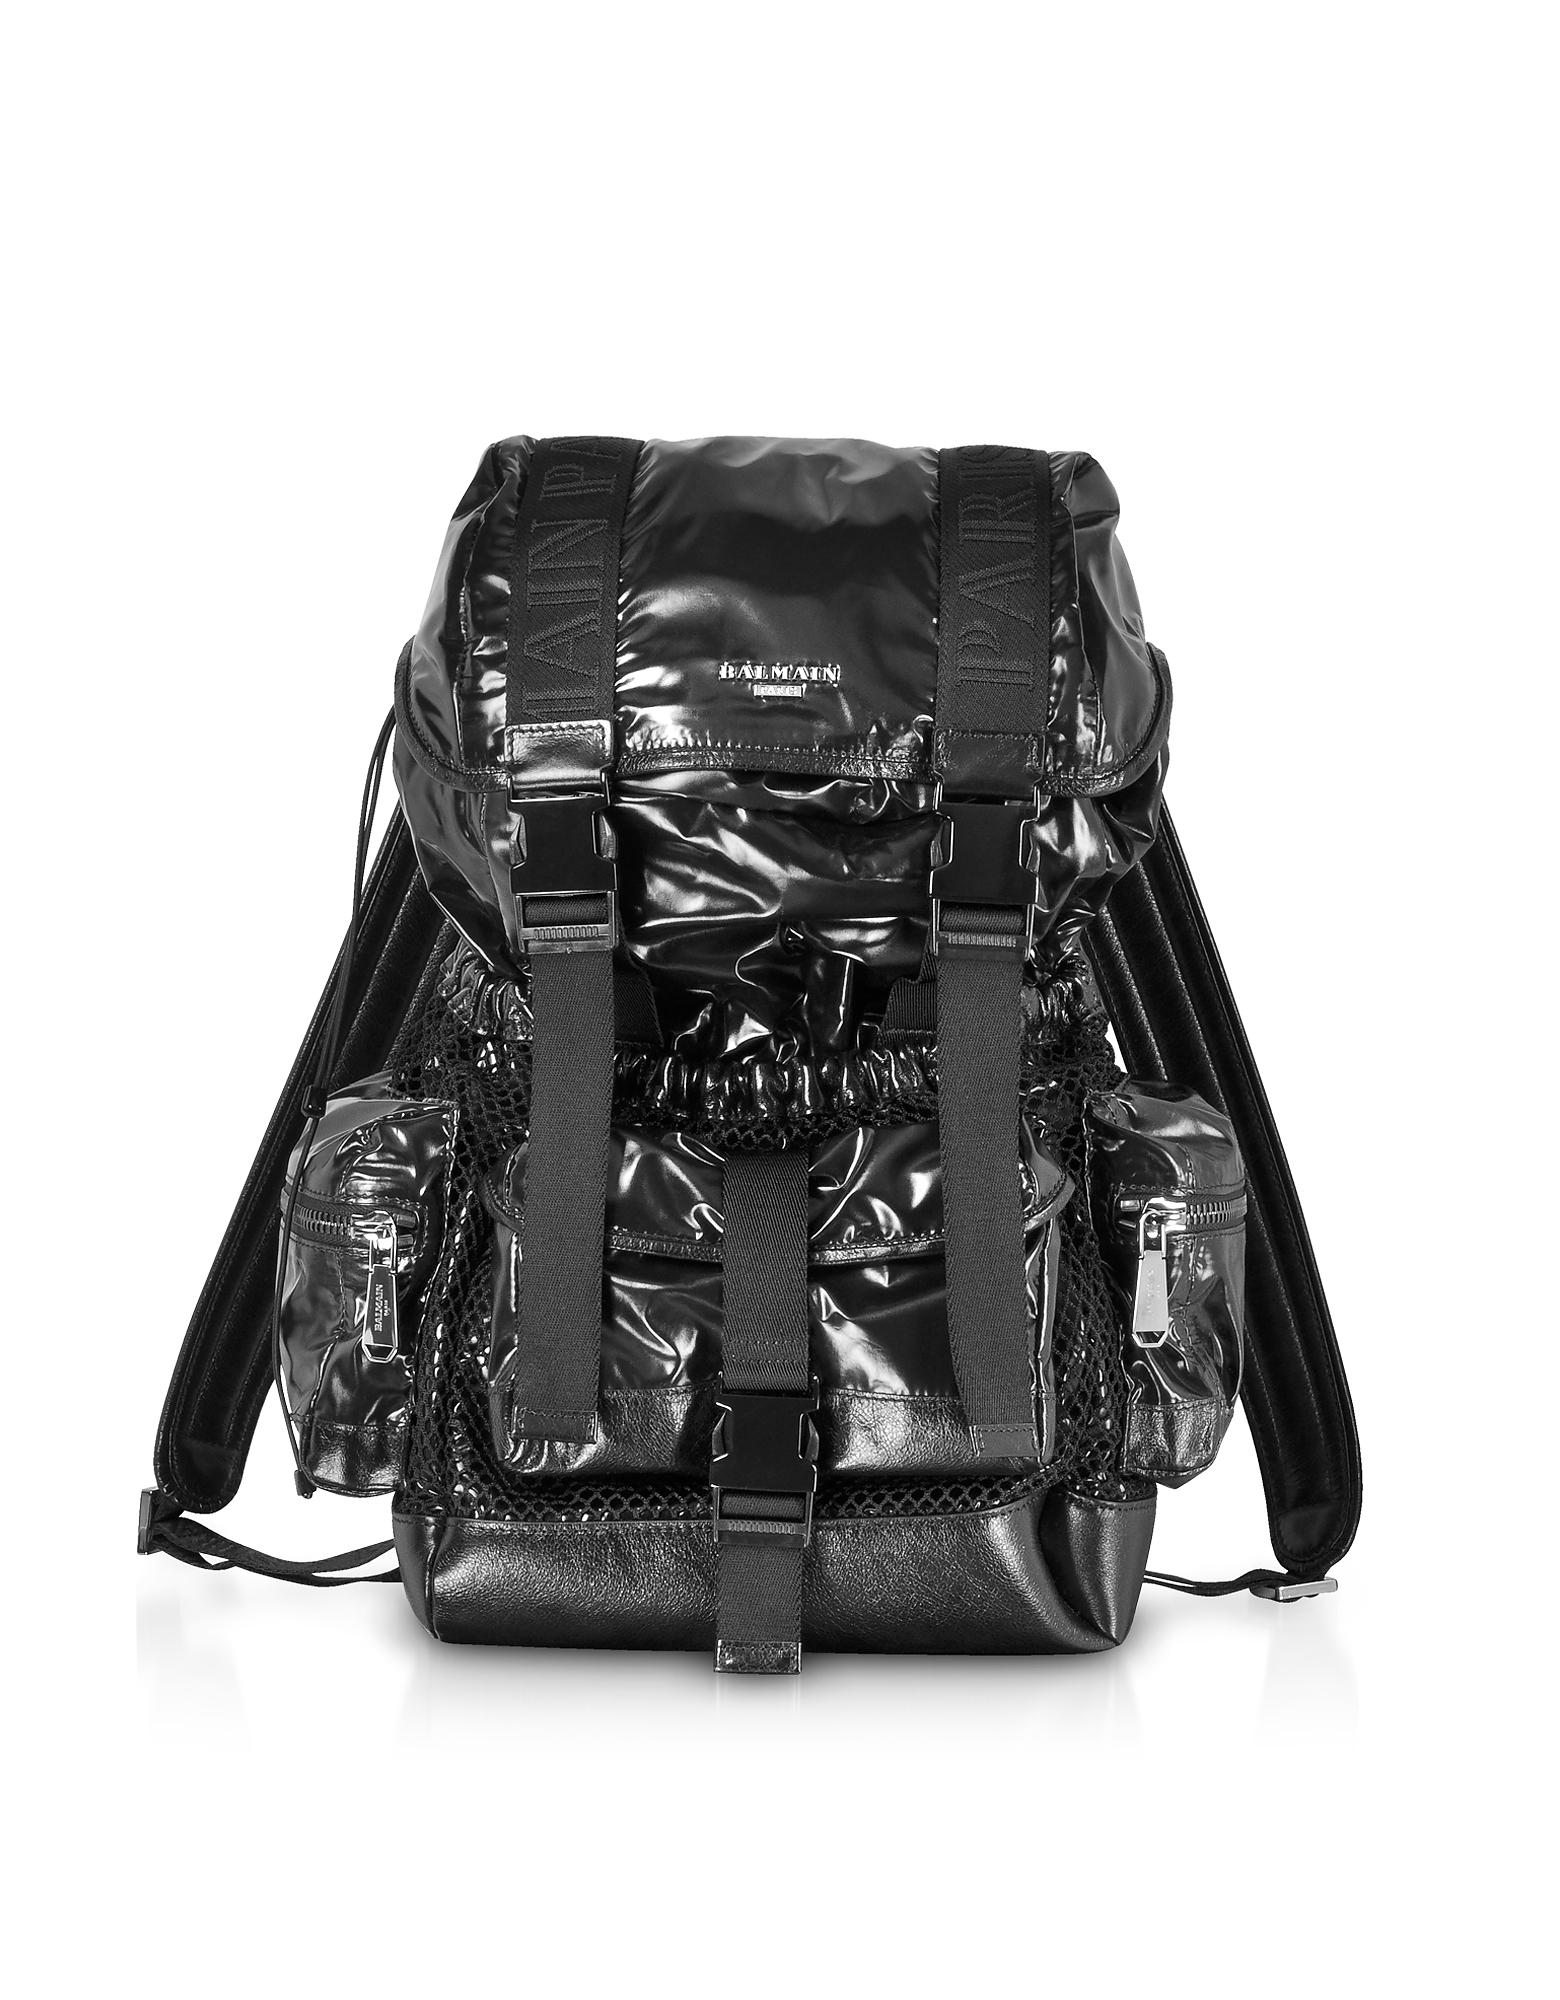 Balmain Backpacks, Black Shiny Nylon and Metallic Mesh Men's Backpack